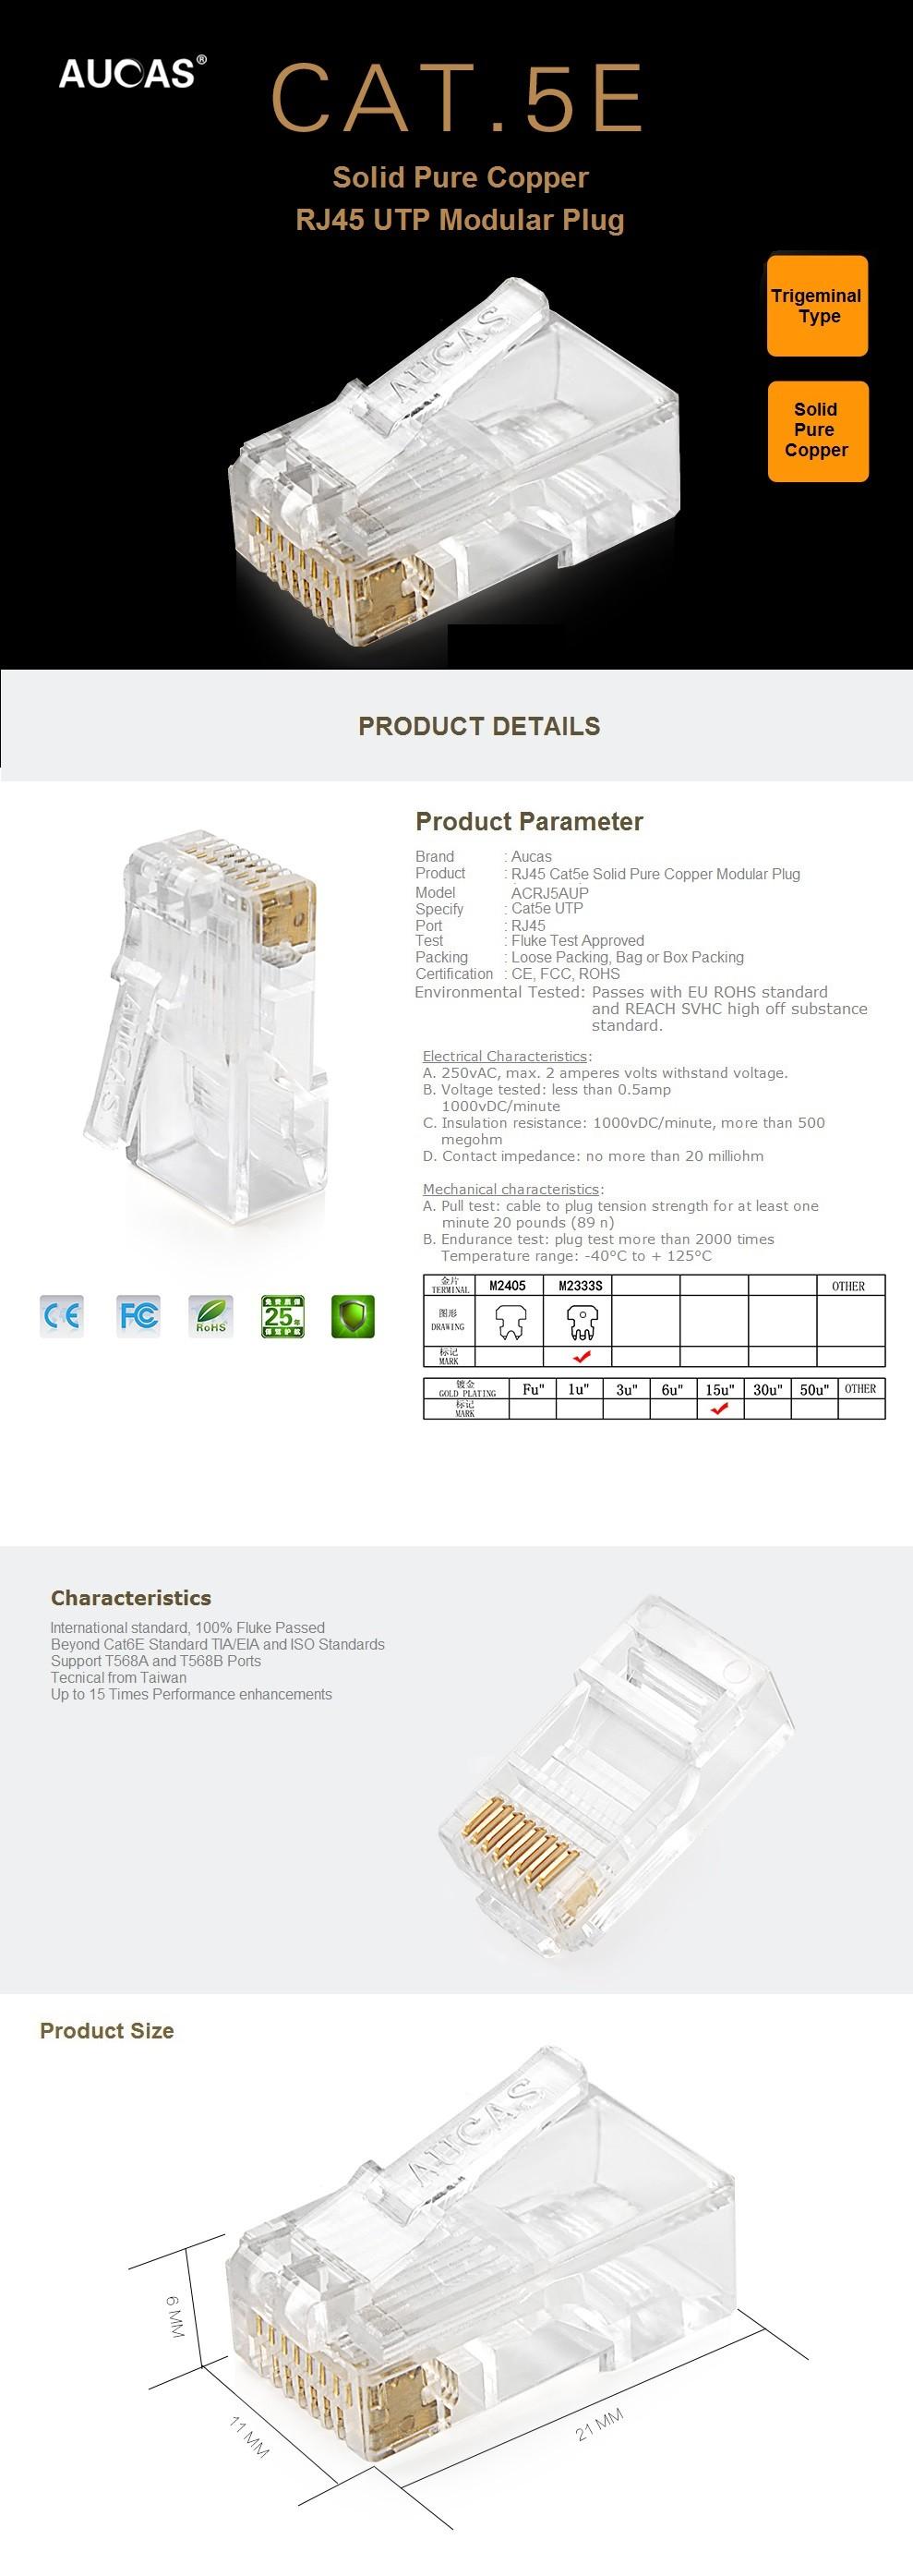 Superb Cat 6E Cat 5 E Utp Rj45 Module Plug With Cat5 Cable Wiring Cover Wiring 101 Relewellnesstrialsorg